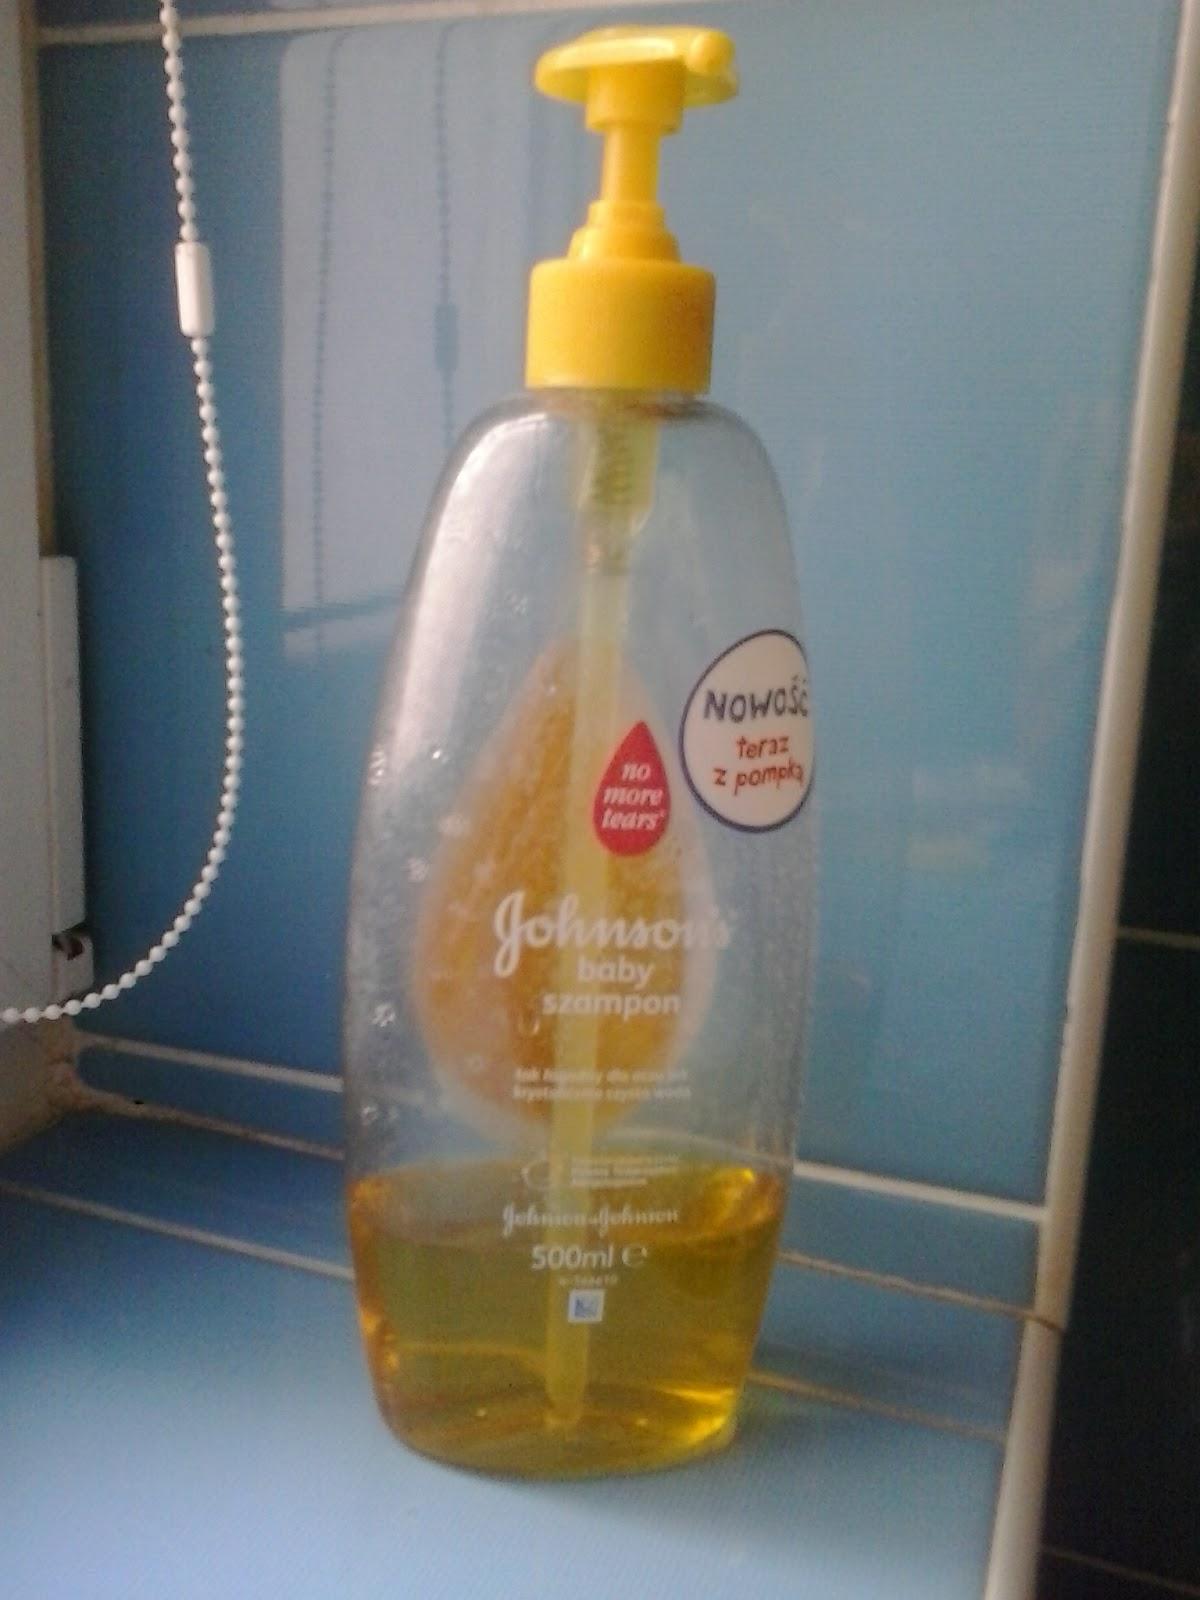 Johnson's baby szampon